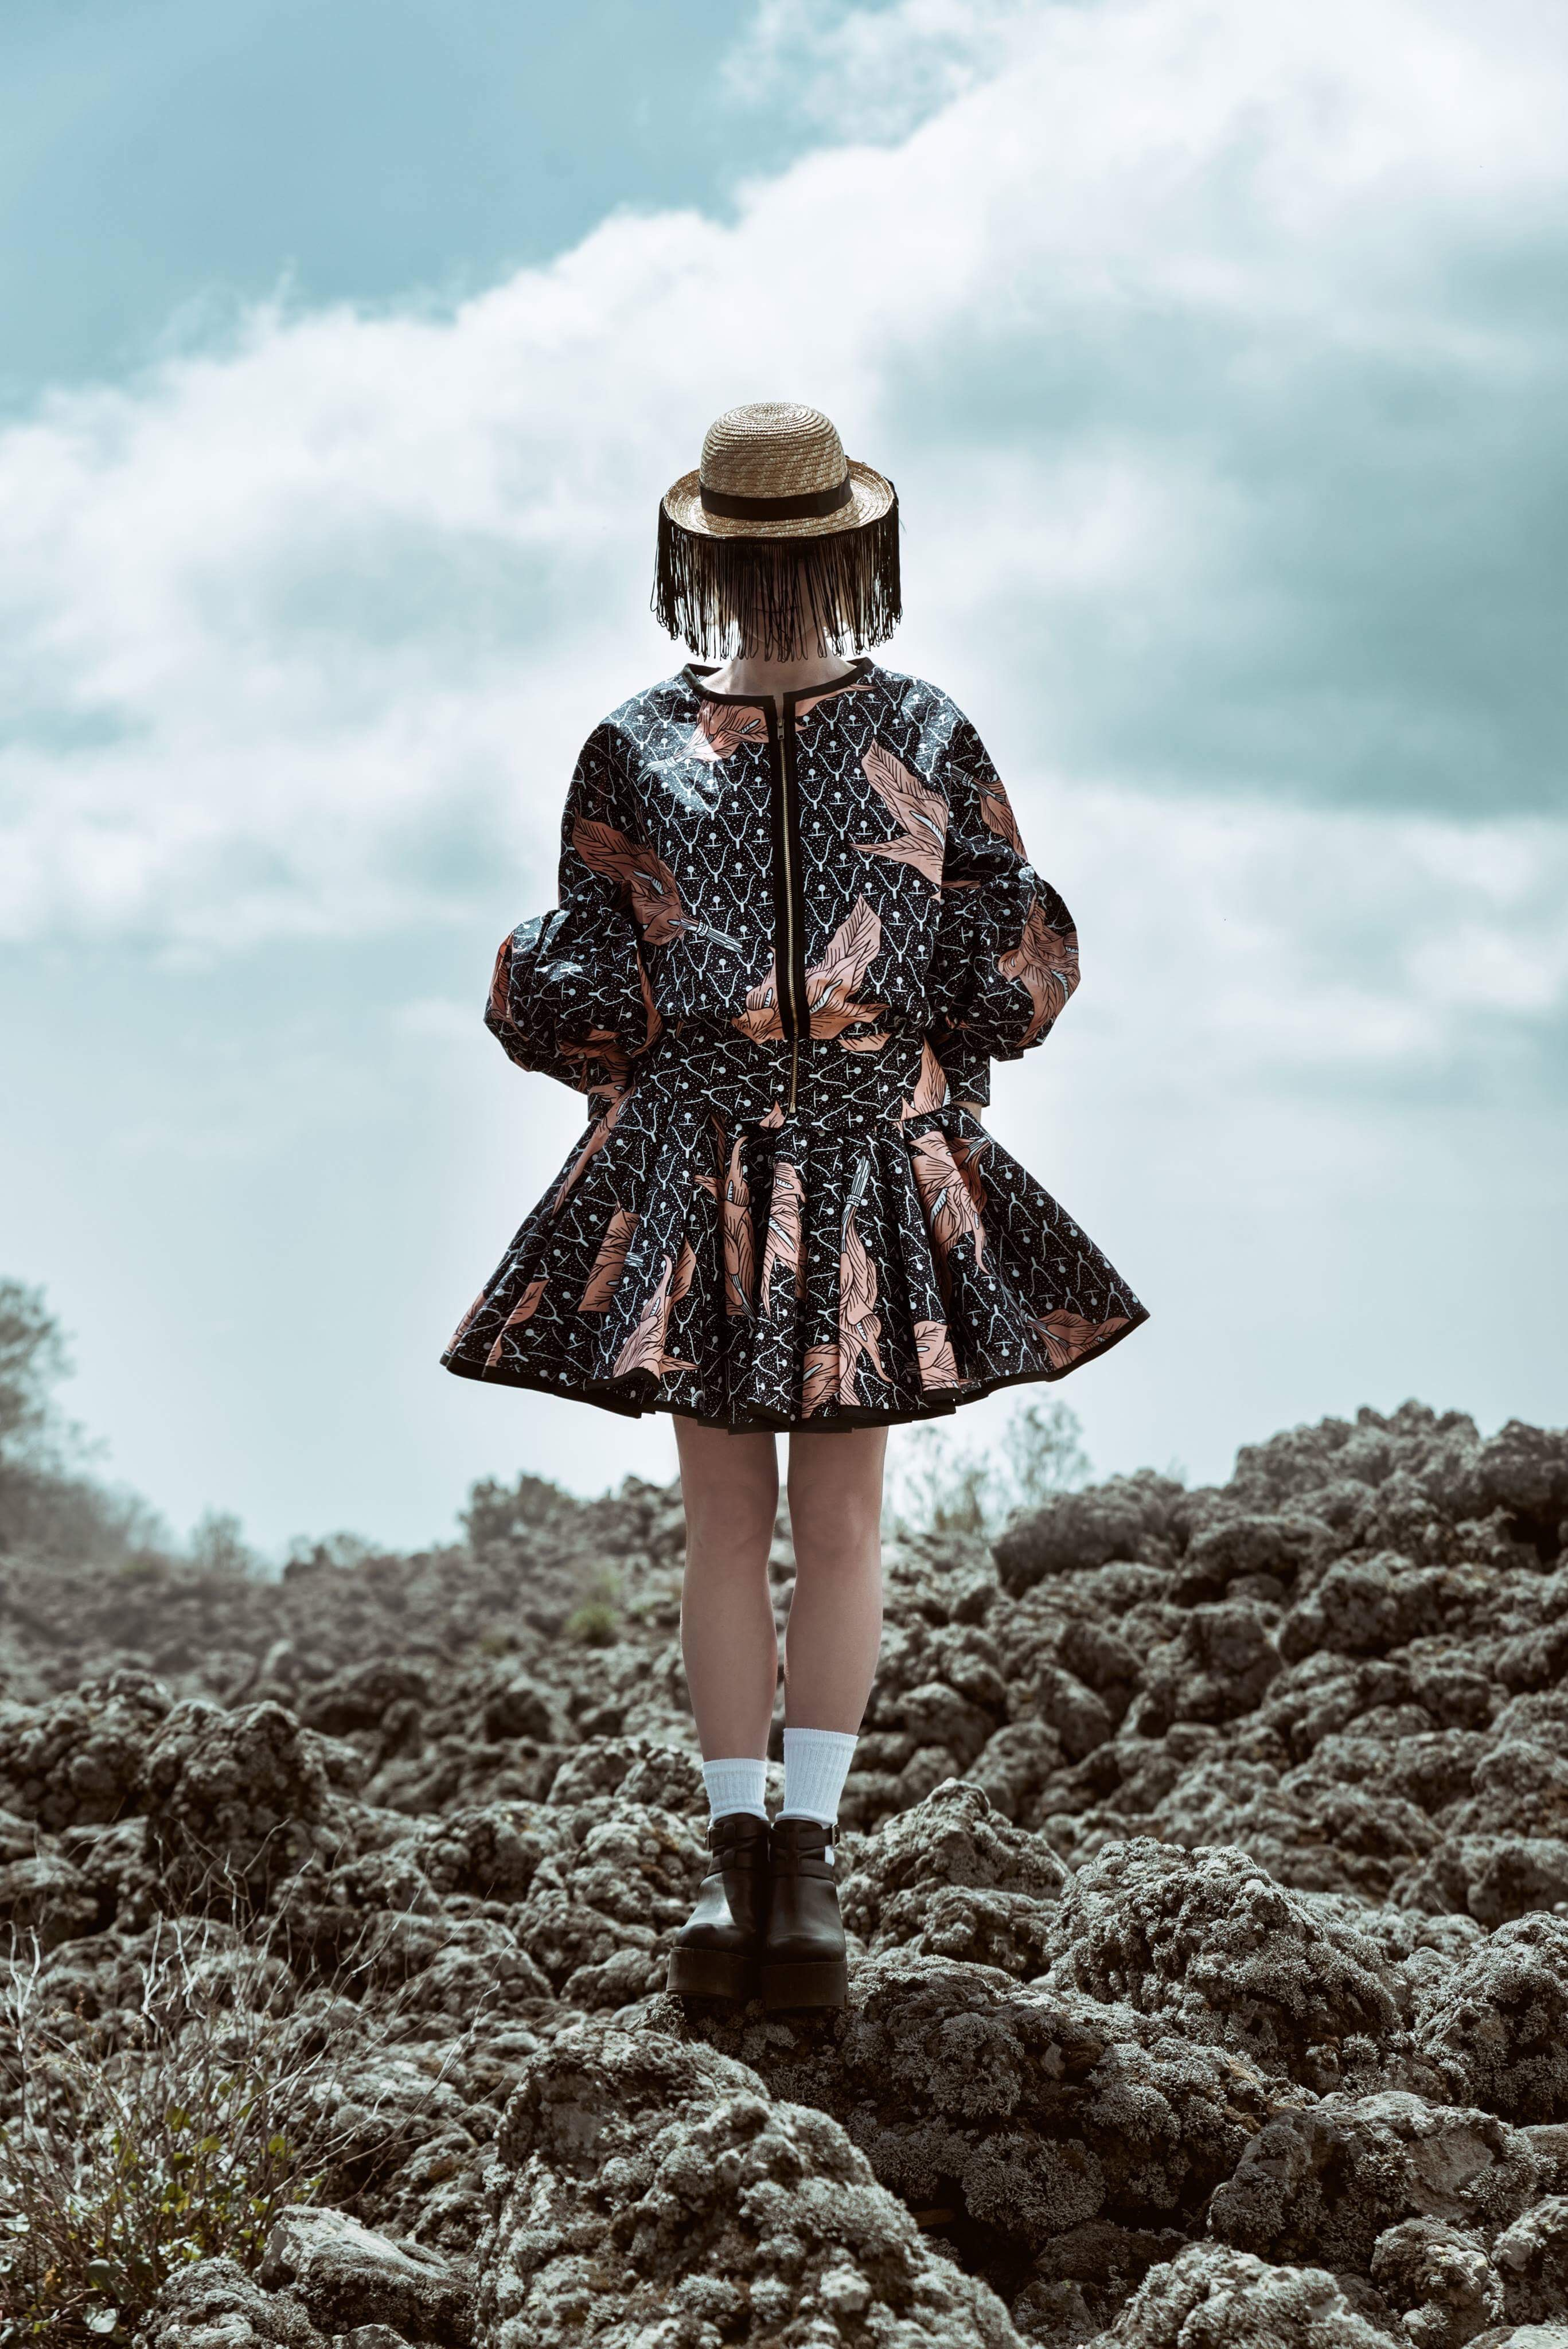 Ibridi shop - spring/summer collection 2018